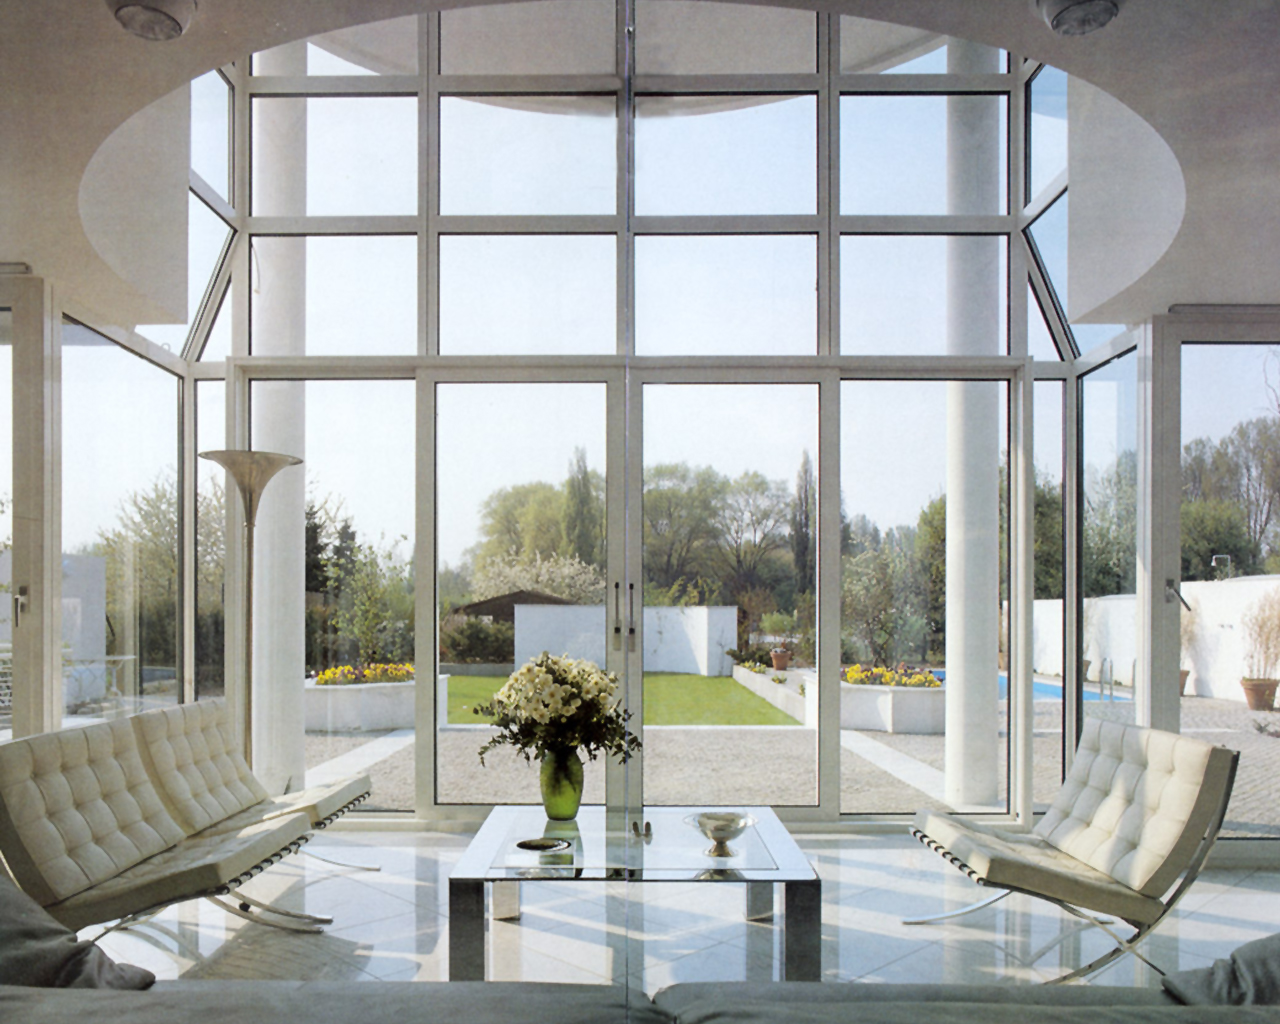 Architekturbüro Angelika Hülser Stöhr: NEUBAU MIT INNENARCHITEKTUR